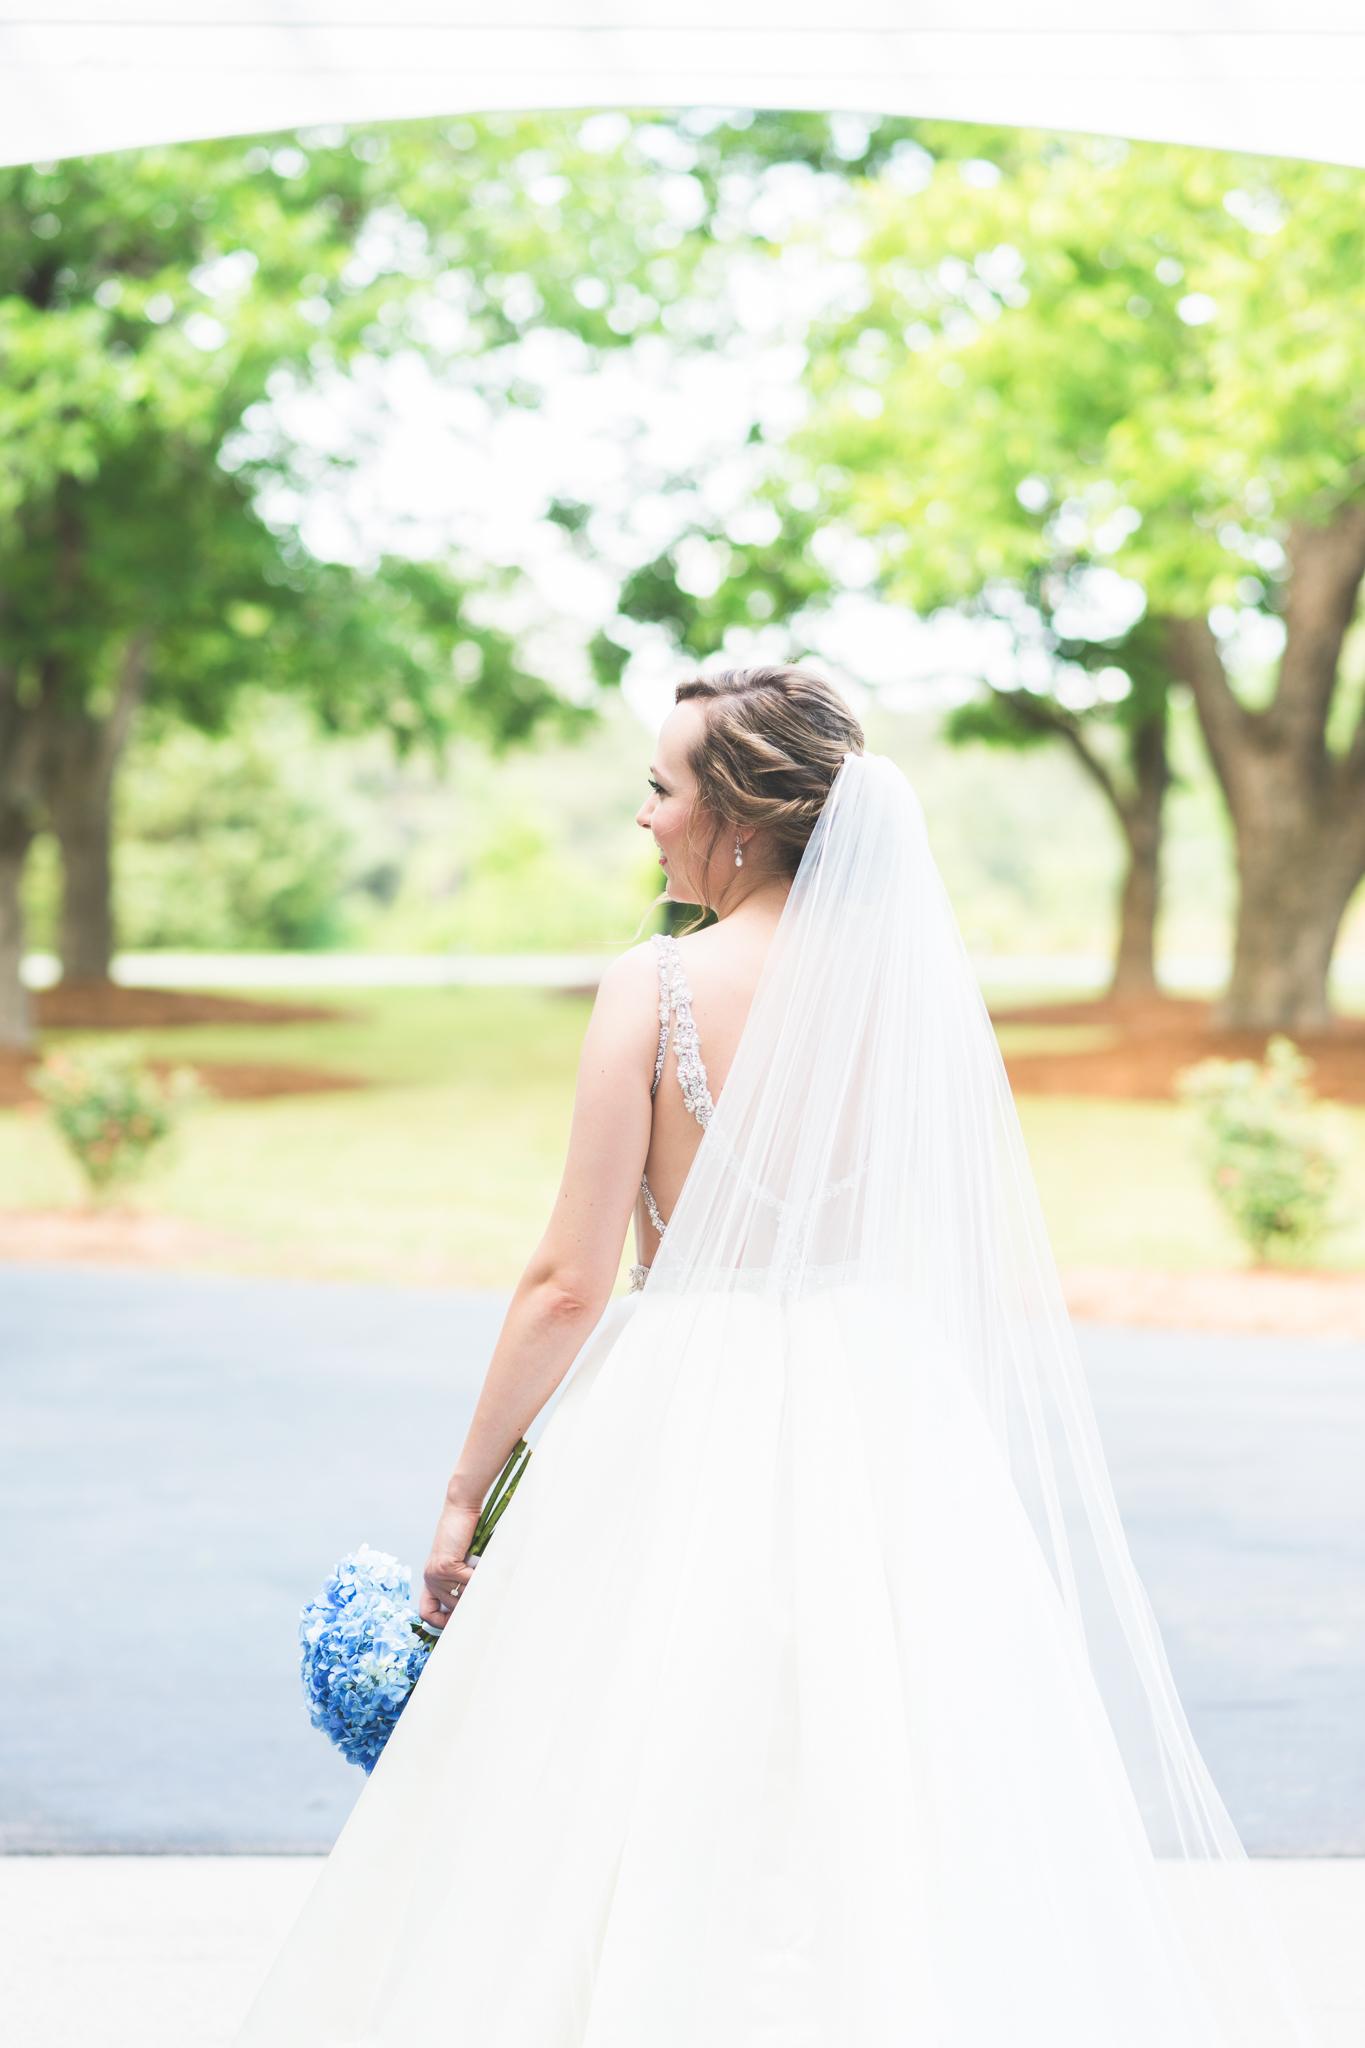 Bridals_MadisonReke_Blog-5.jpg